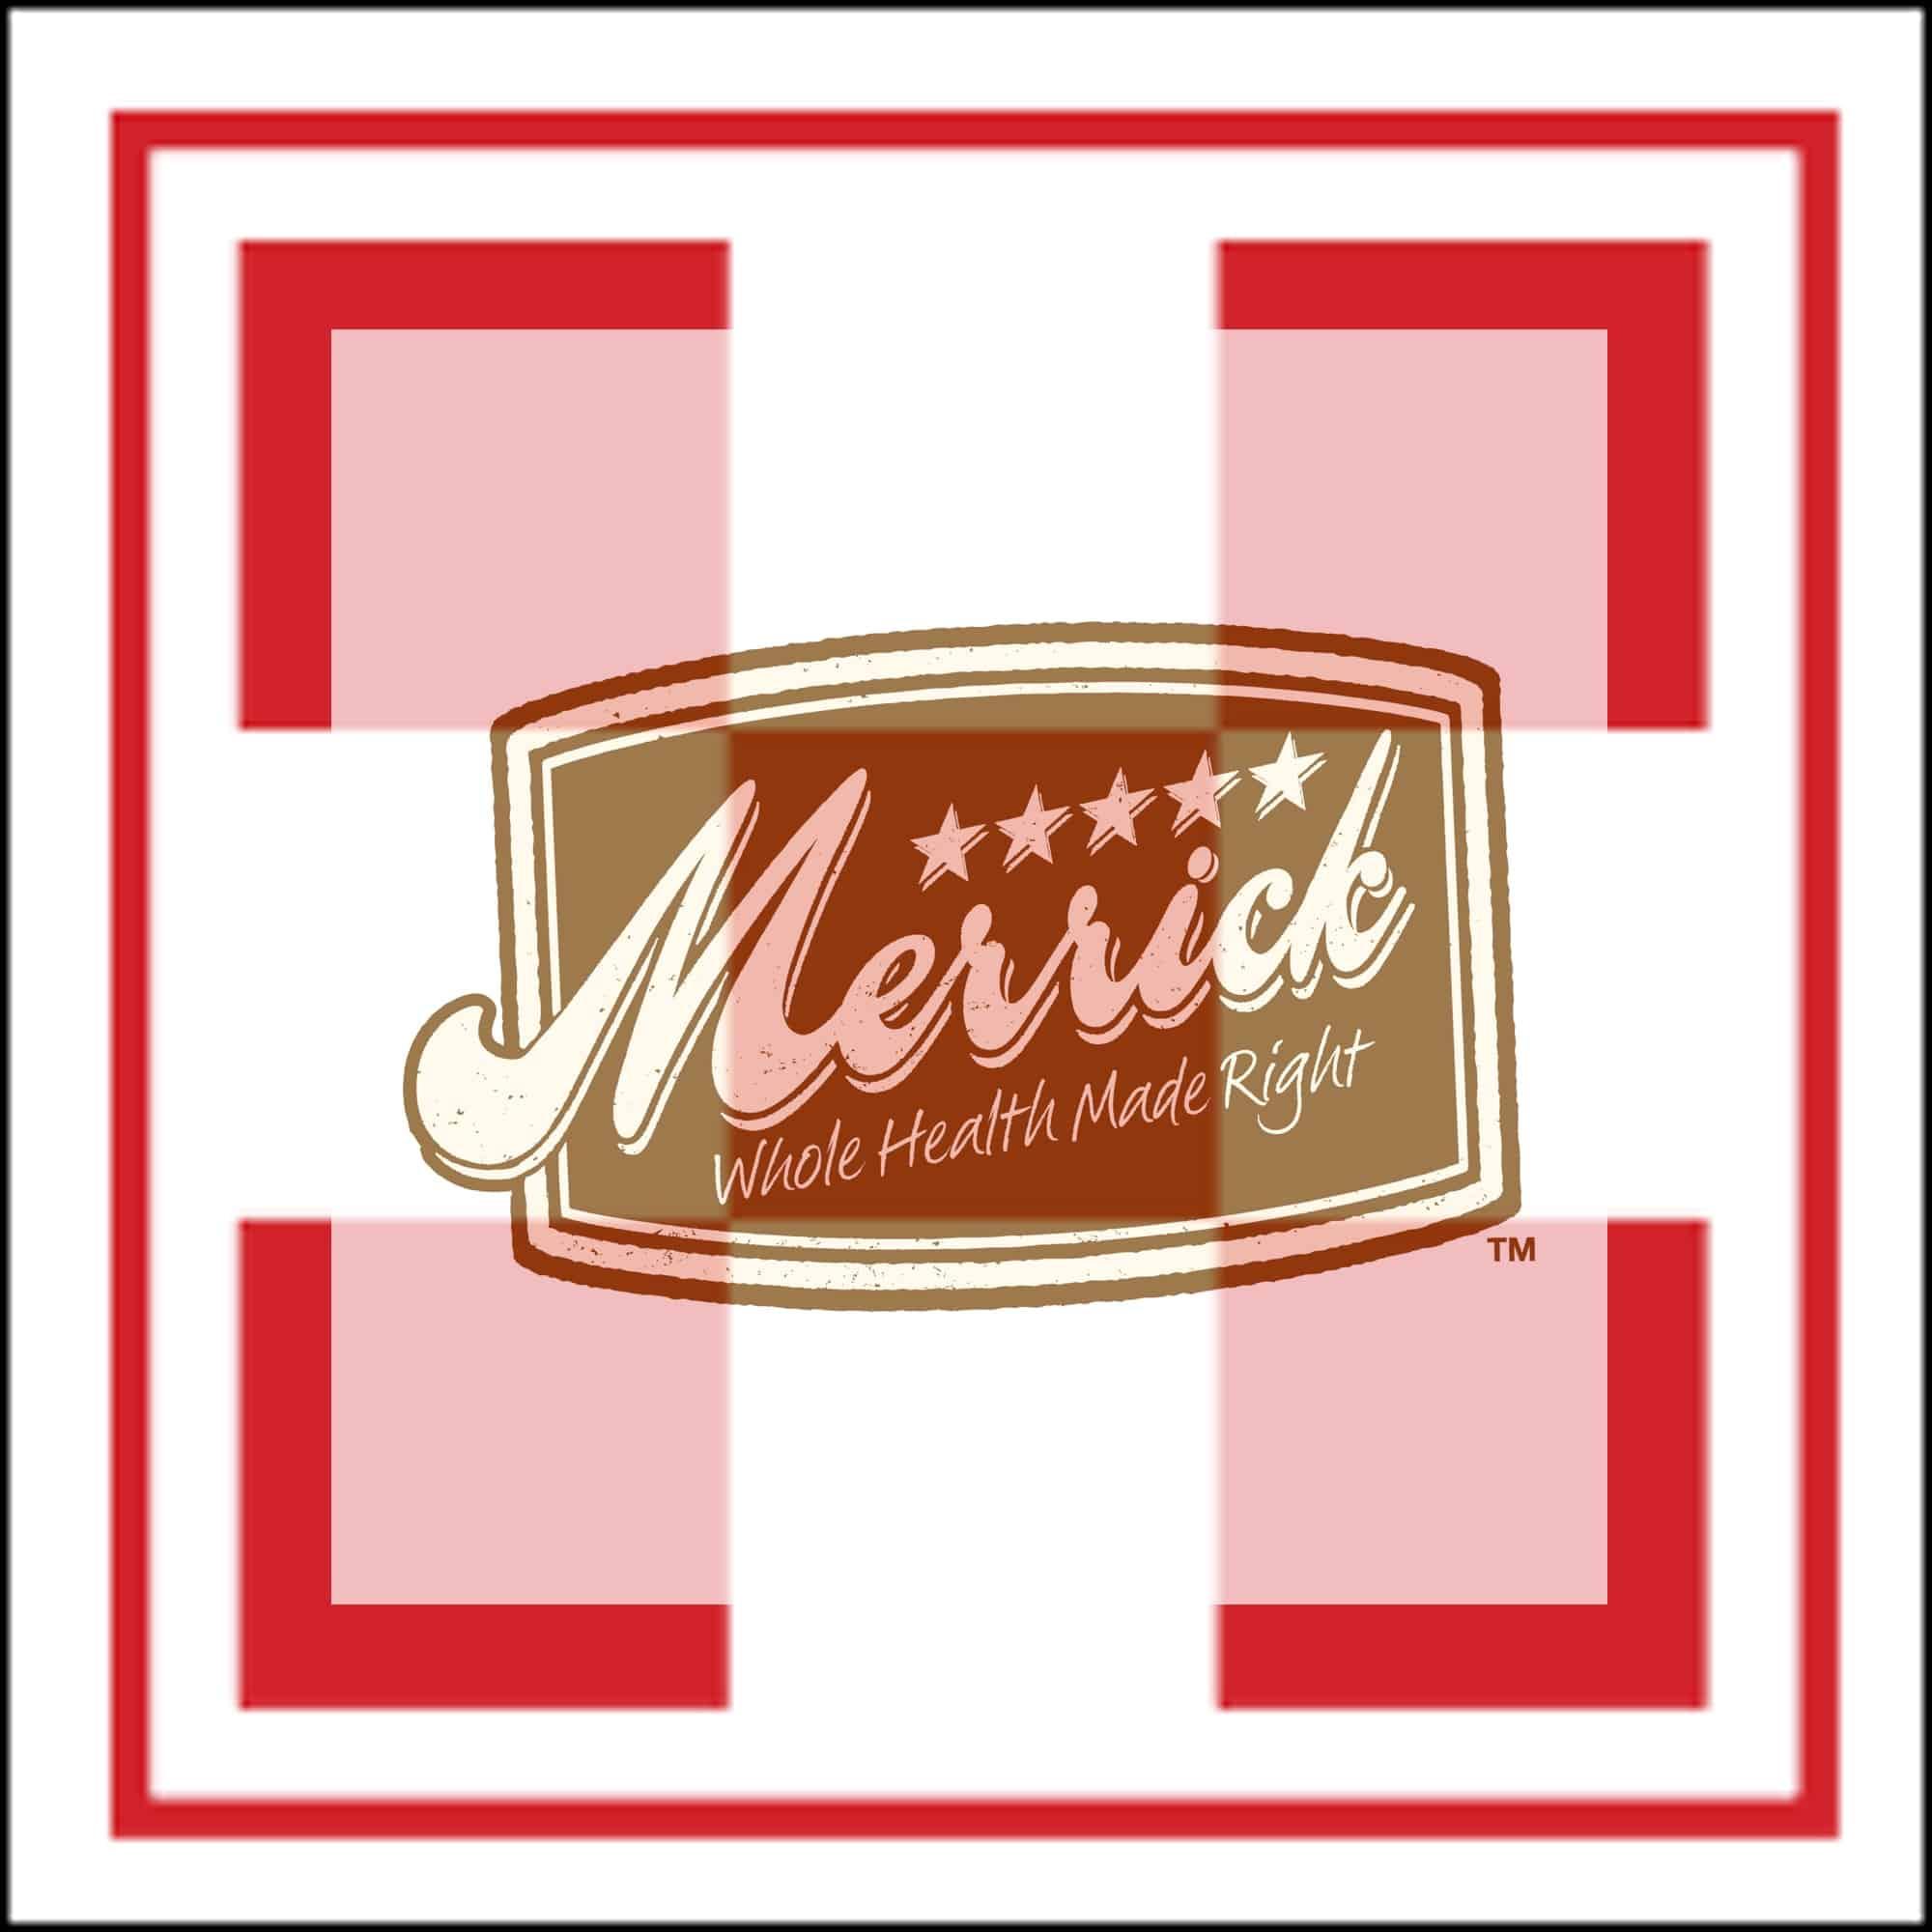 BREAKING Public Outcry: Purina Buys Merrick's Organic Food